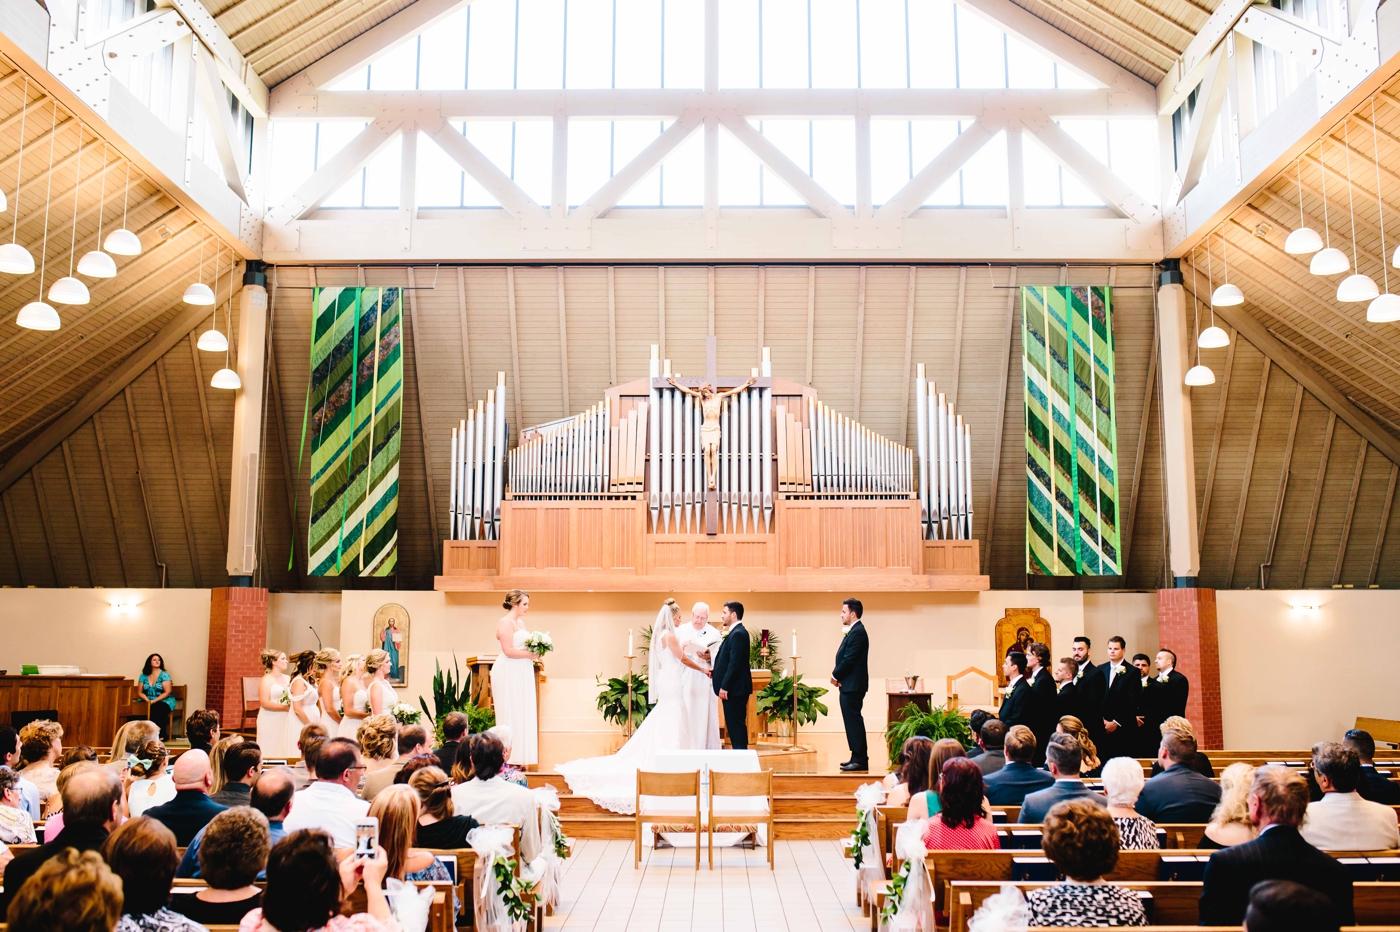 chicago-fine-art-wedding-photography-patano22